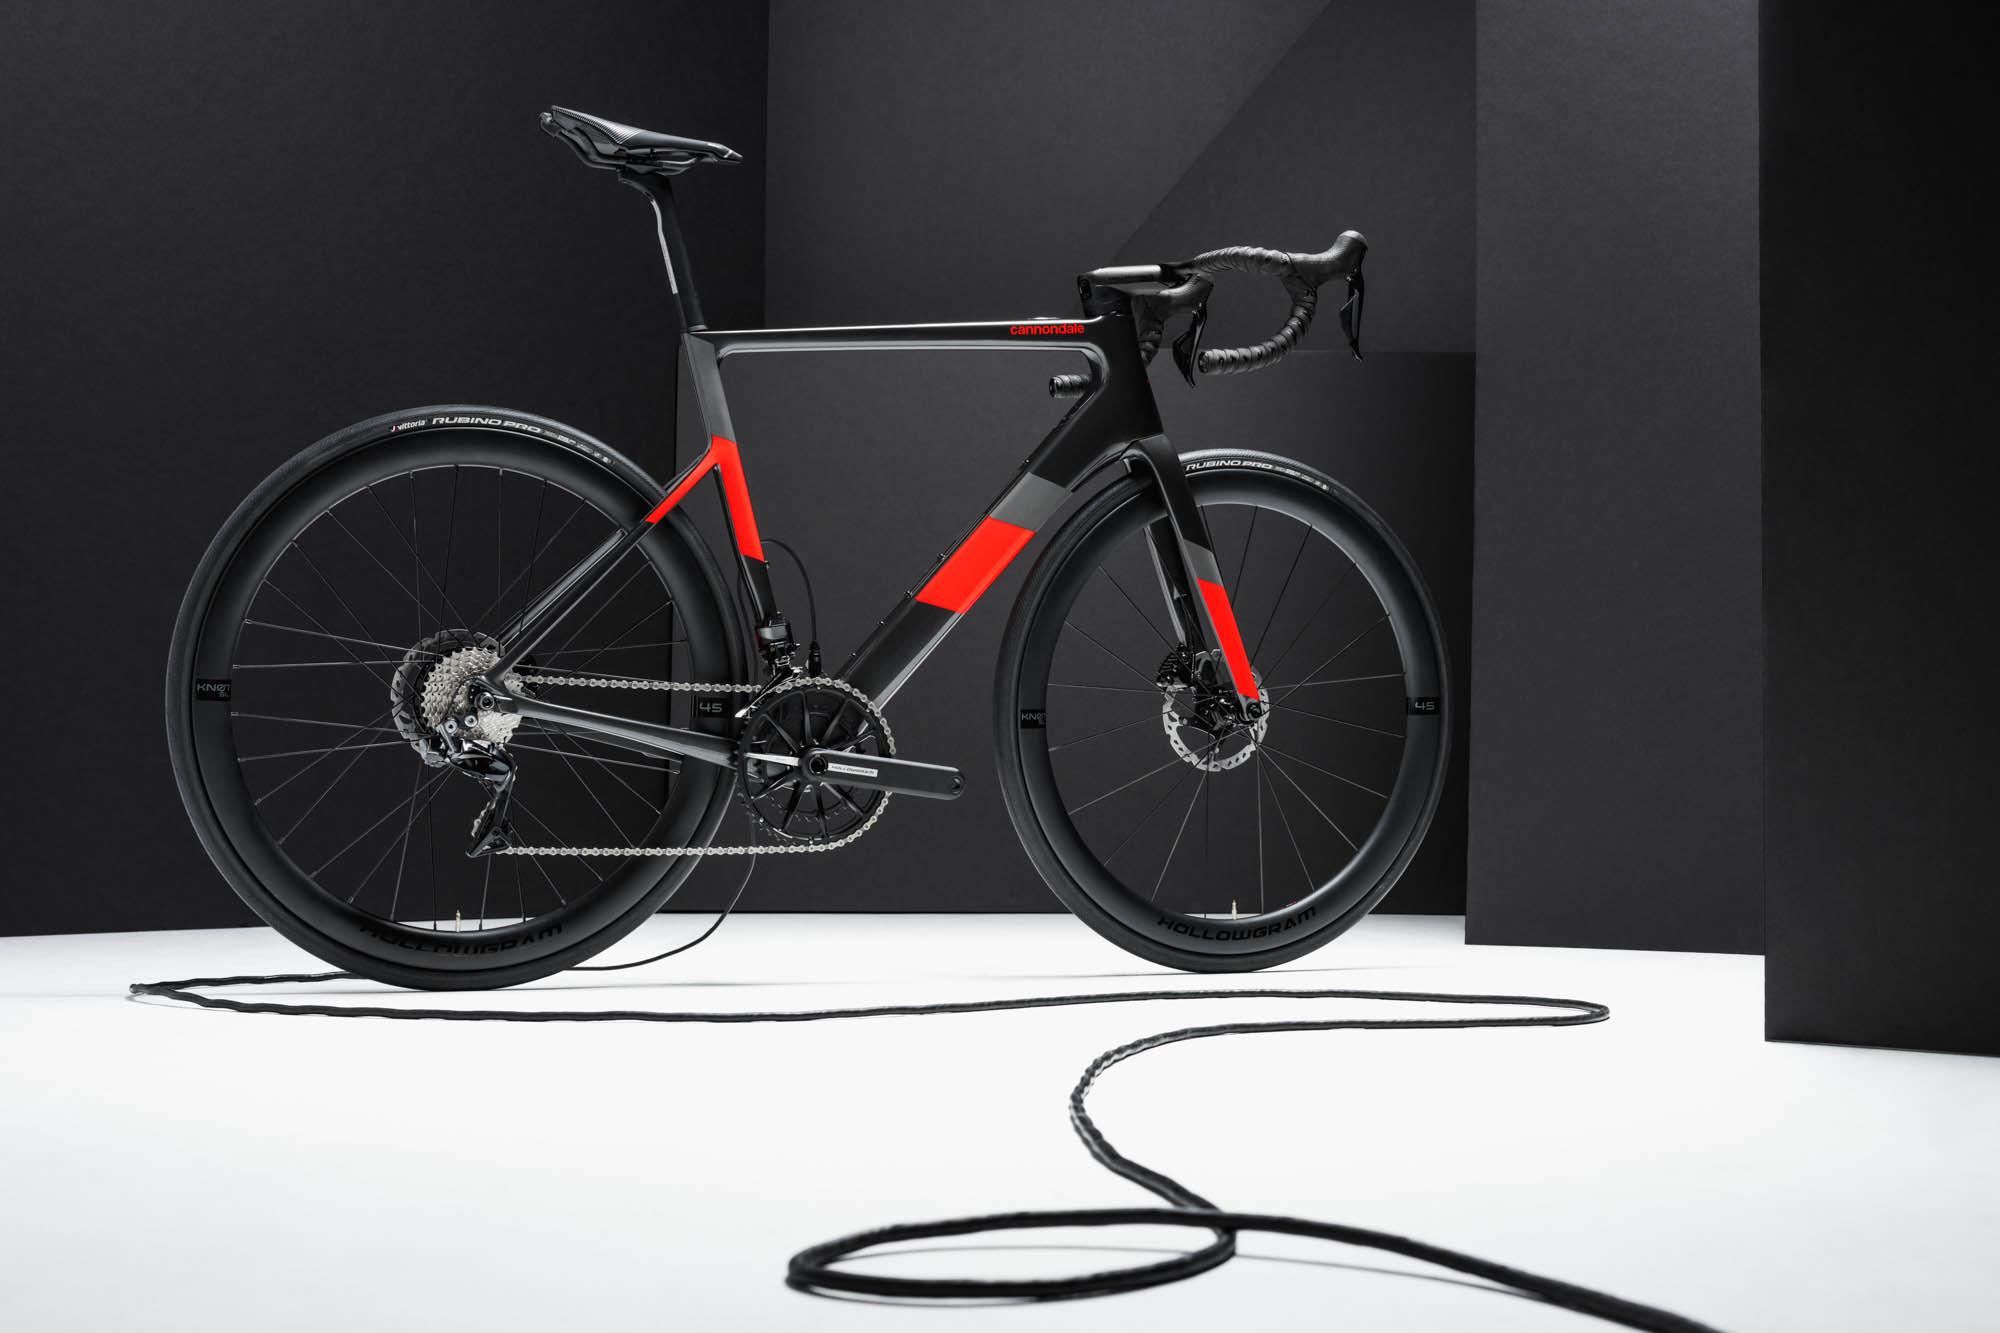 Nowy Cannondale SuperSix EVO Neo – rower e-road stworzony do latania